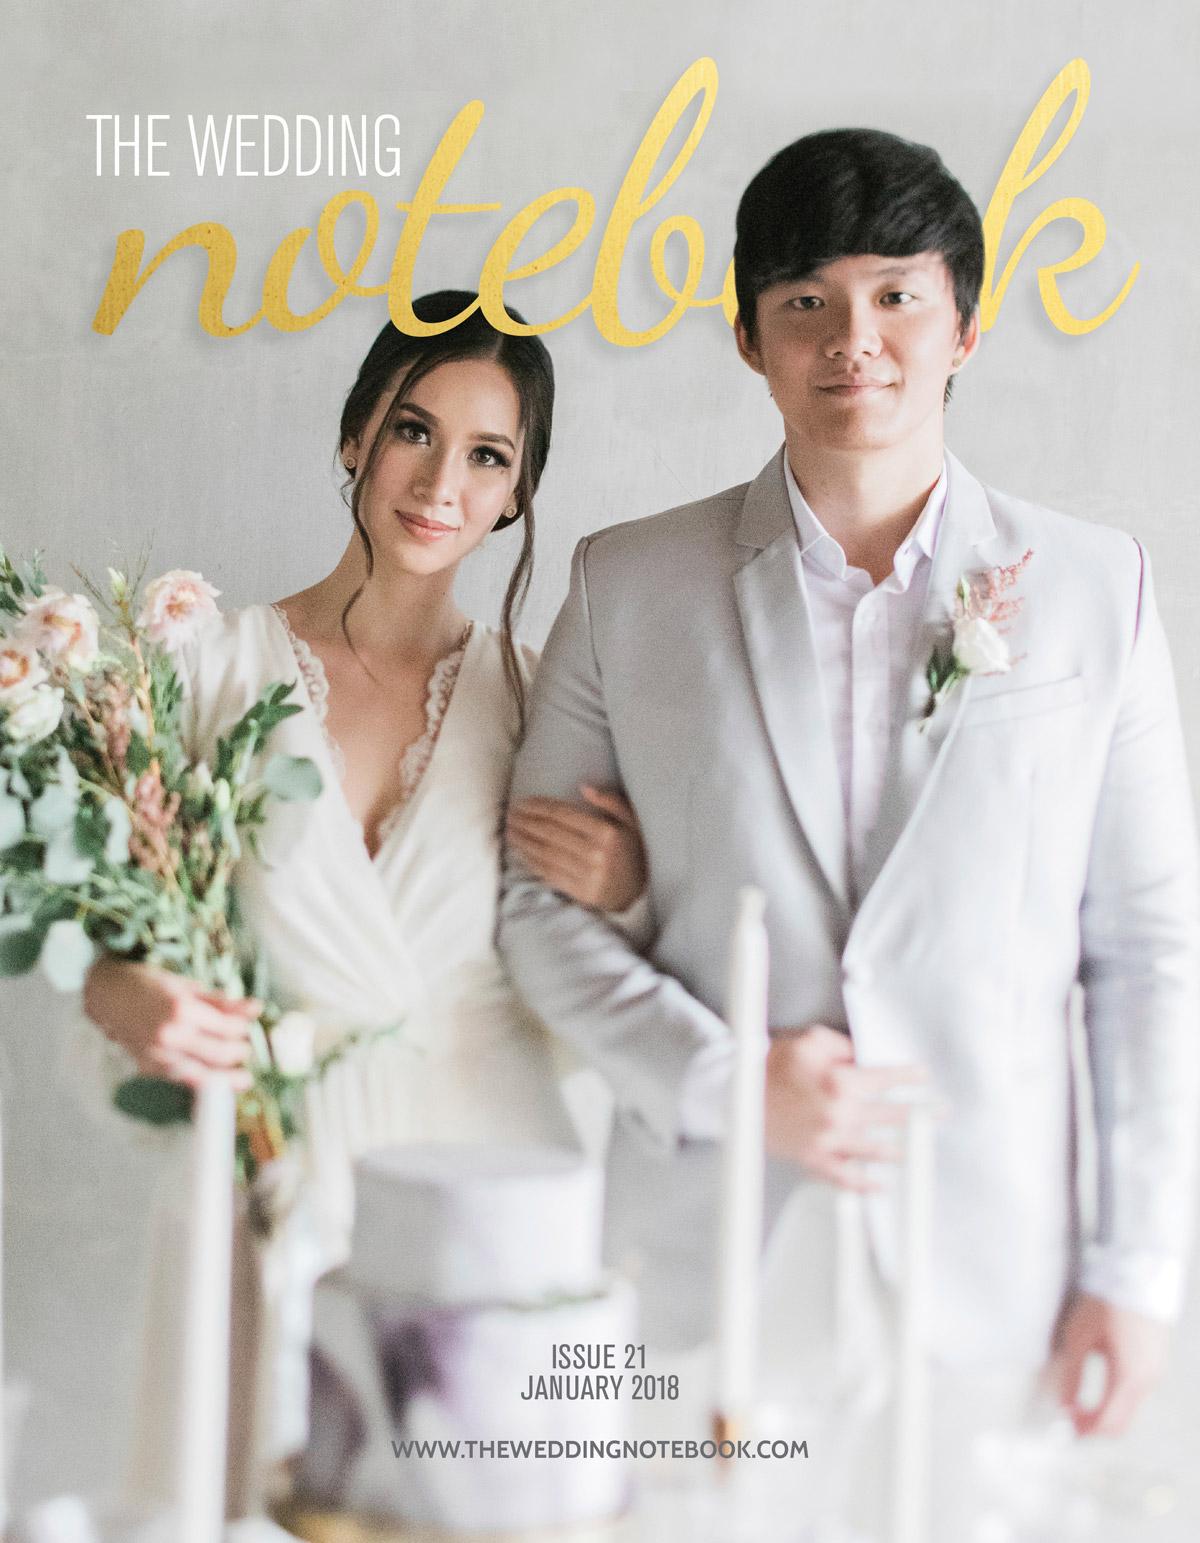 The Wedding Notebook Magazine January 2018 – Issue 21 - The Wedding ...